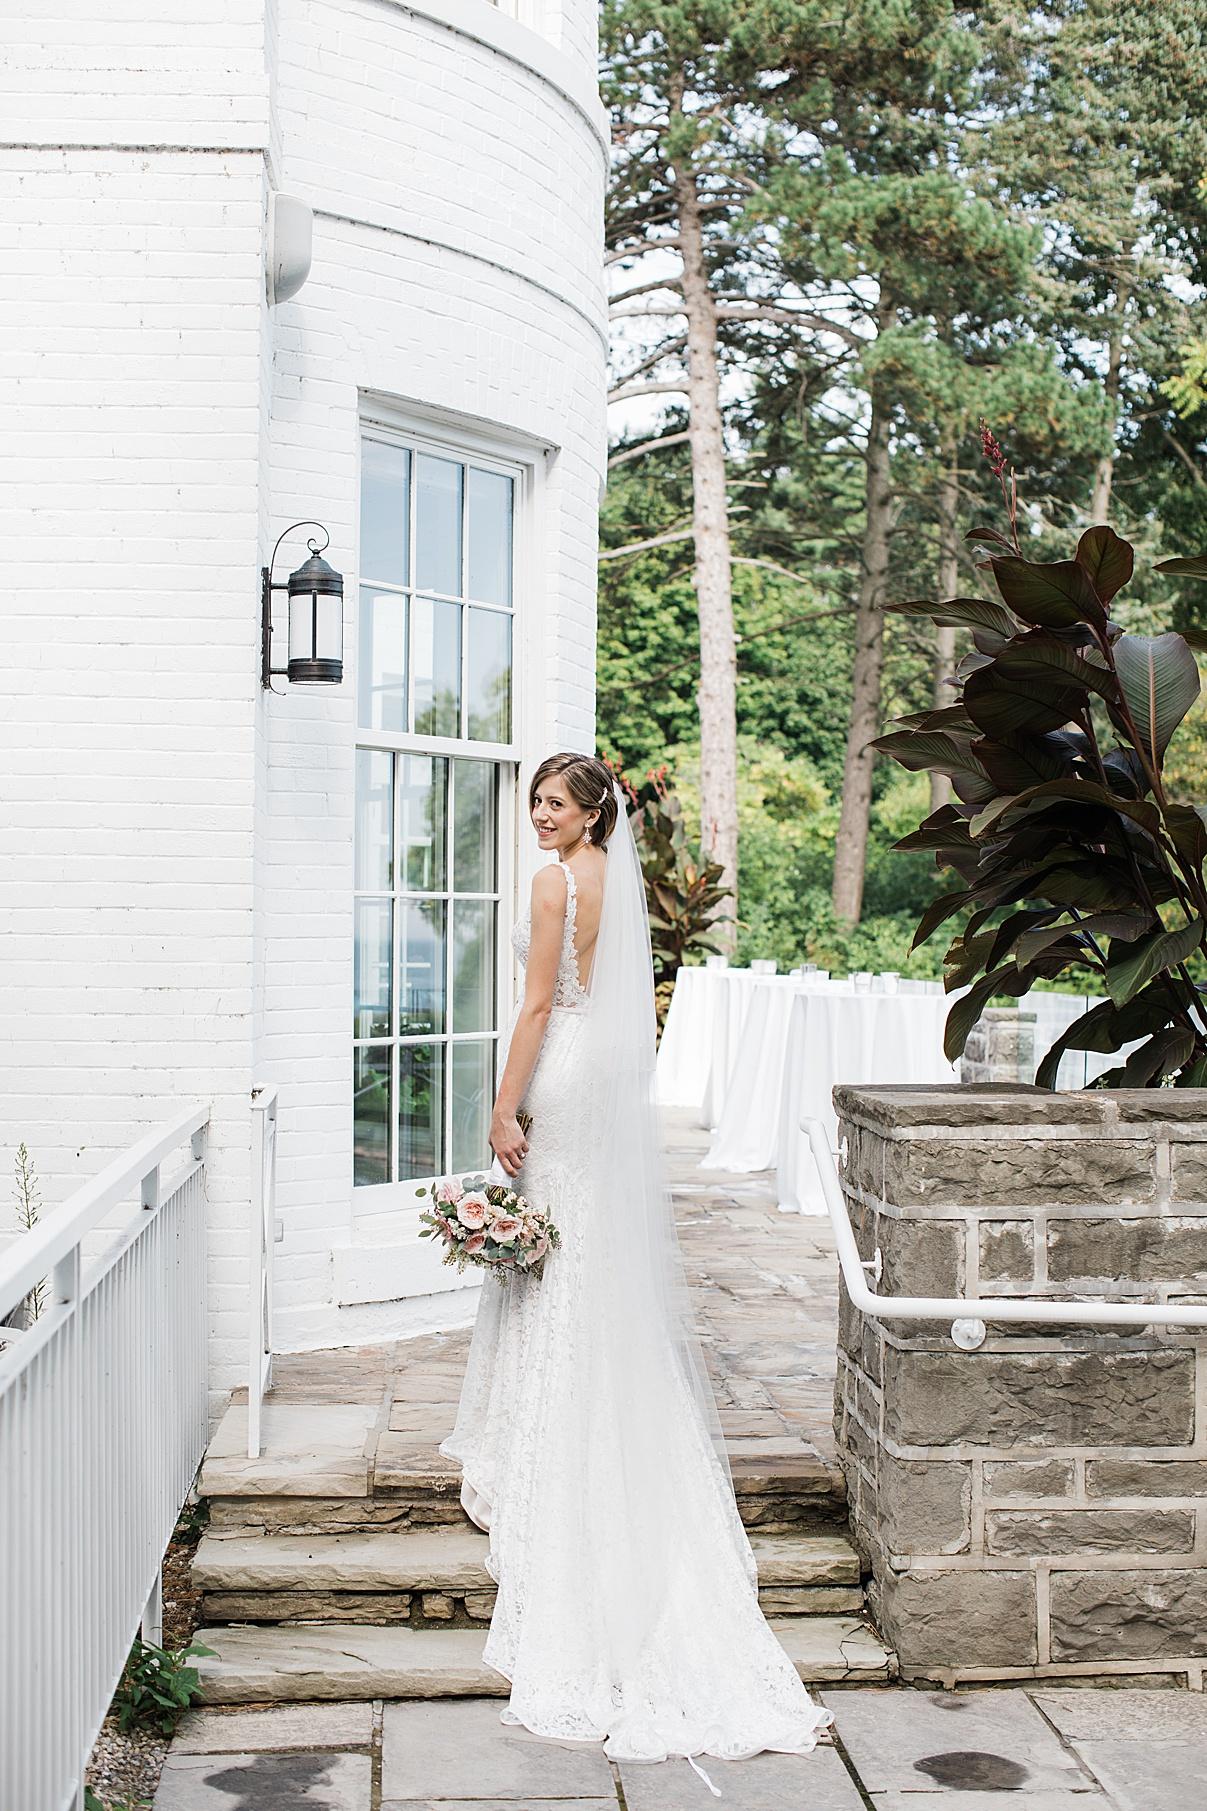 Bridal portrait -bride on steps| Harding Waterfront Estate Wedding| Ontario wedding photographer| Toronto wedding photographer| 3 Photography | 3photography.ca